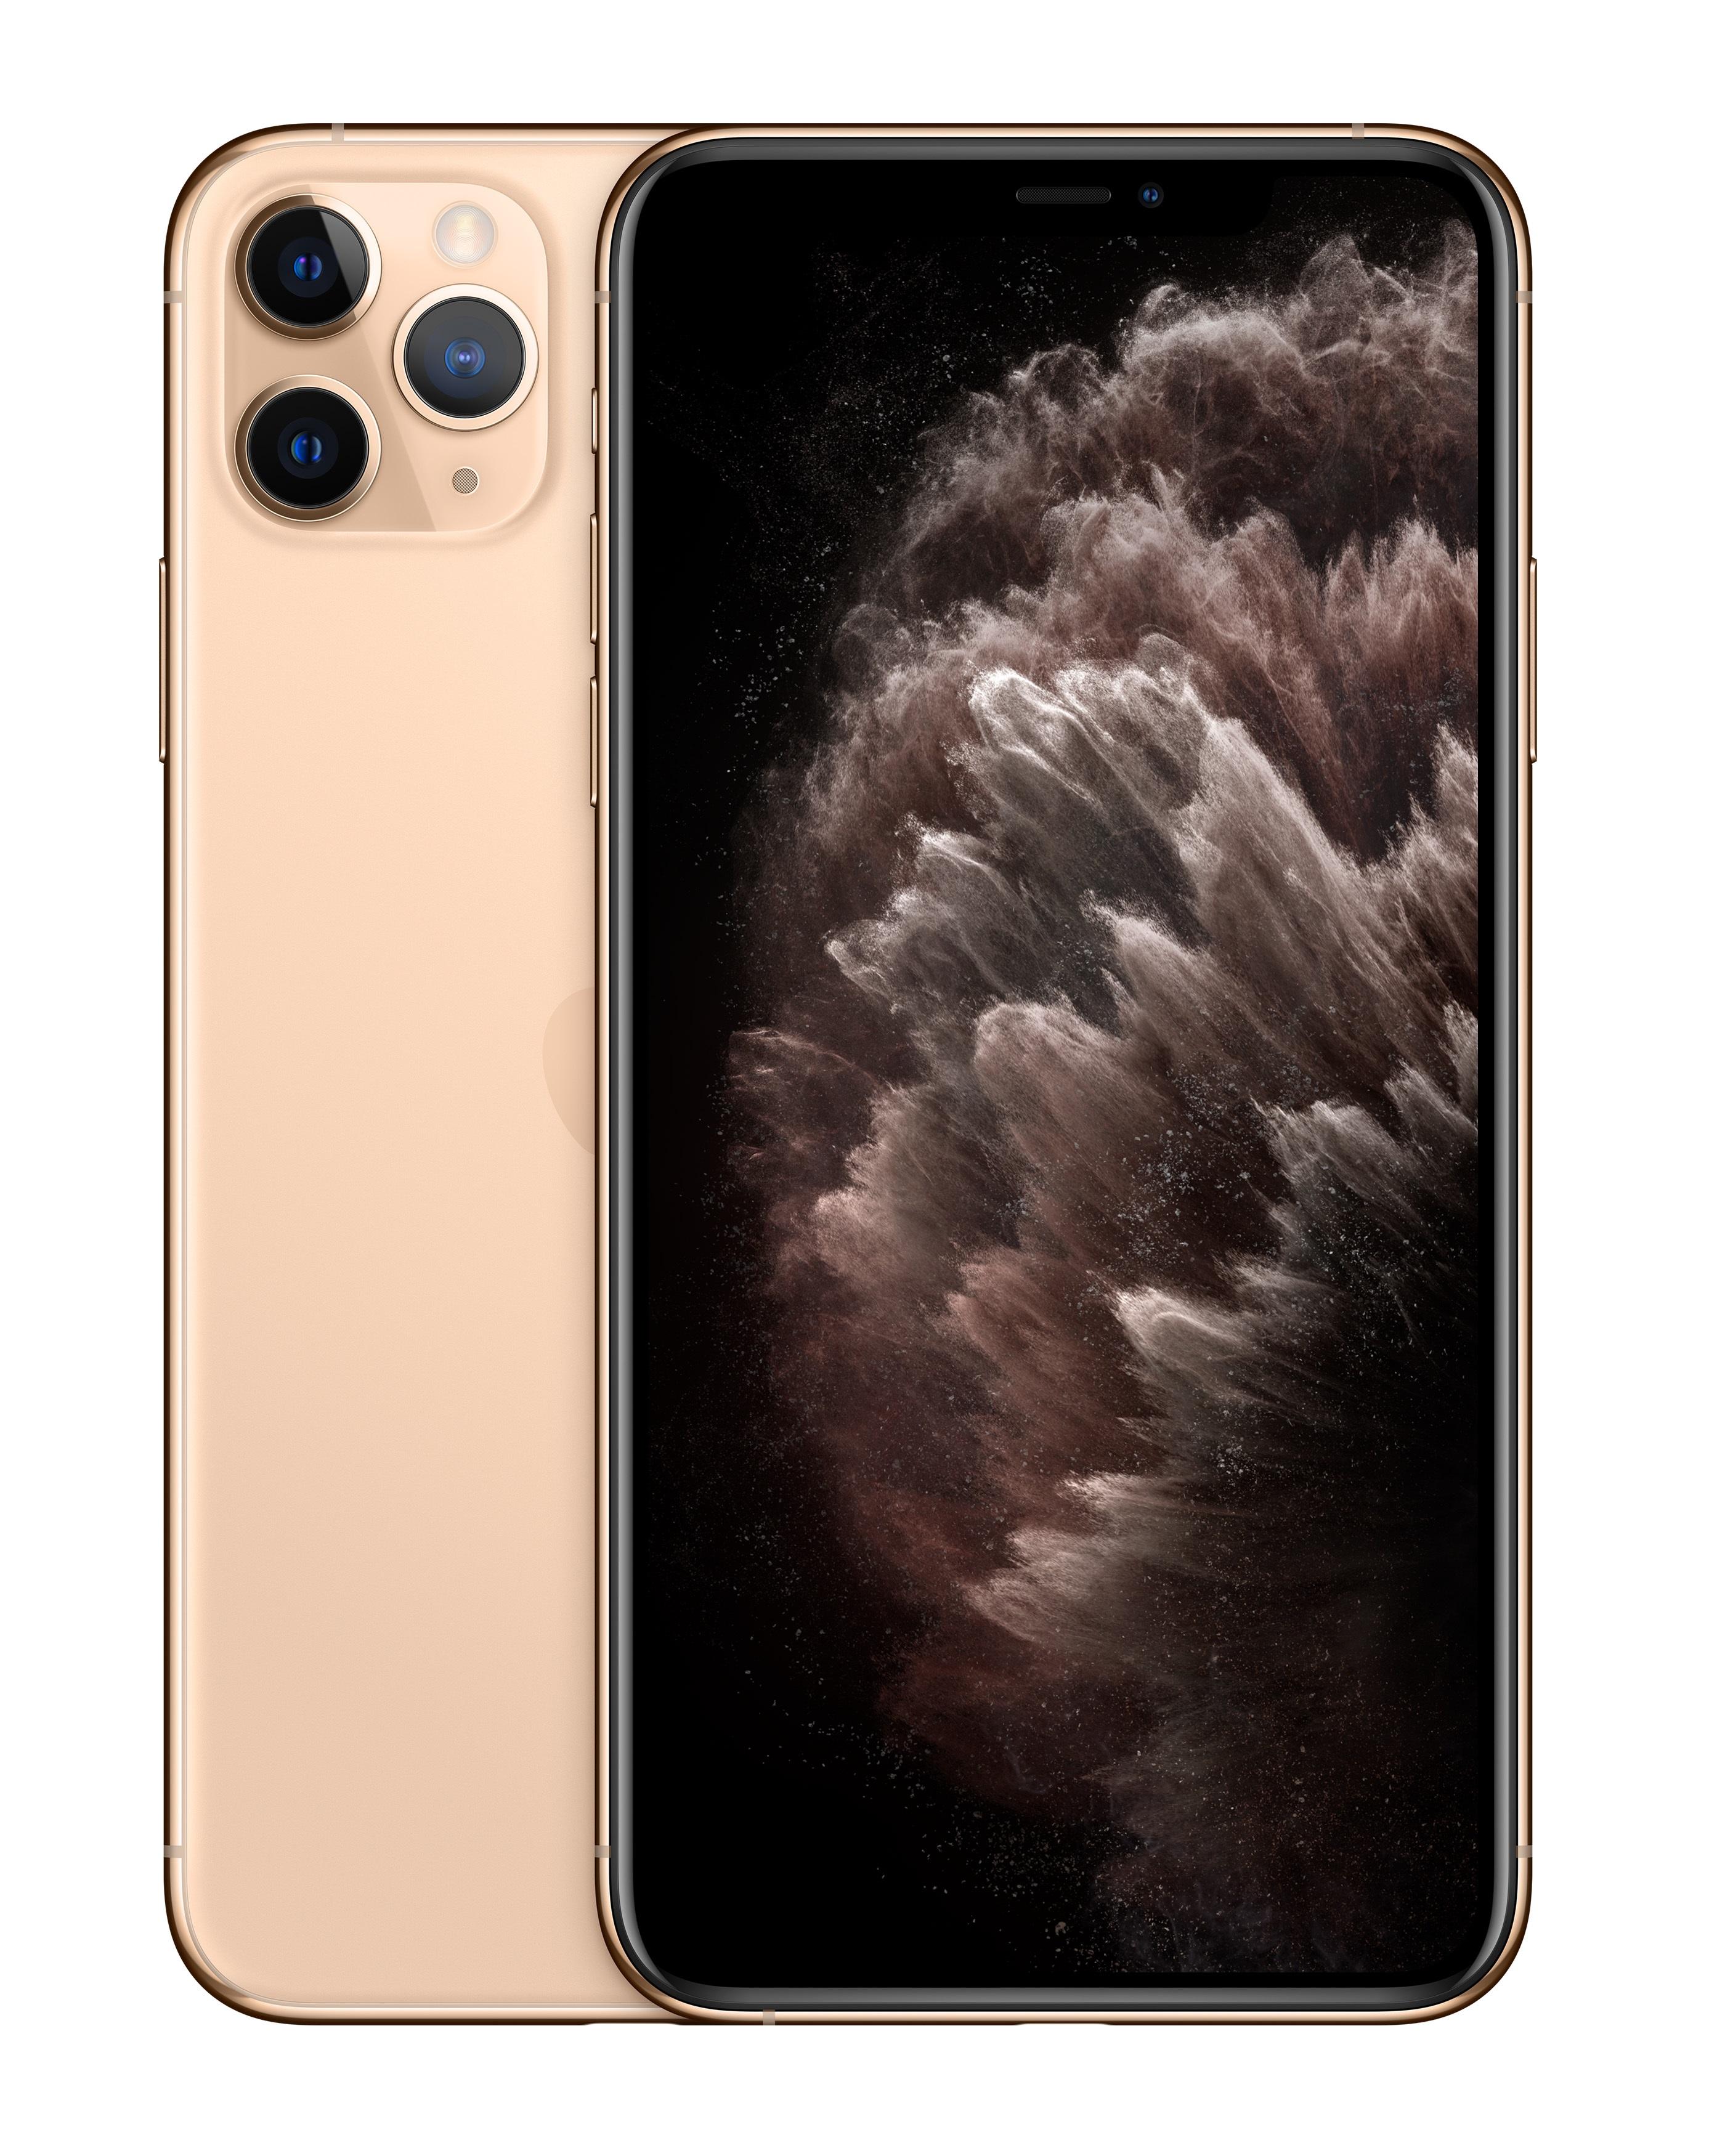 Plexcom - Hardware for You - Apple iPhone 11 Pro Max - Smartphone -  Dual-SIM - 4G Gigabit Class LTE - 512 GB - GSM - 6.5